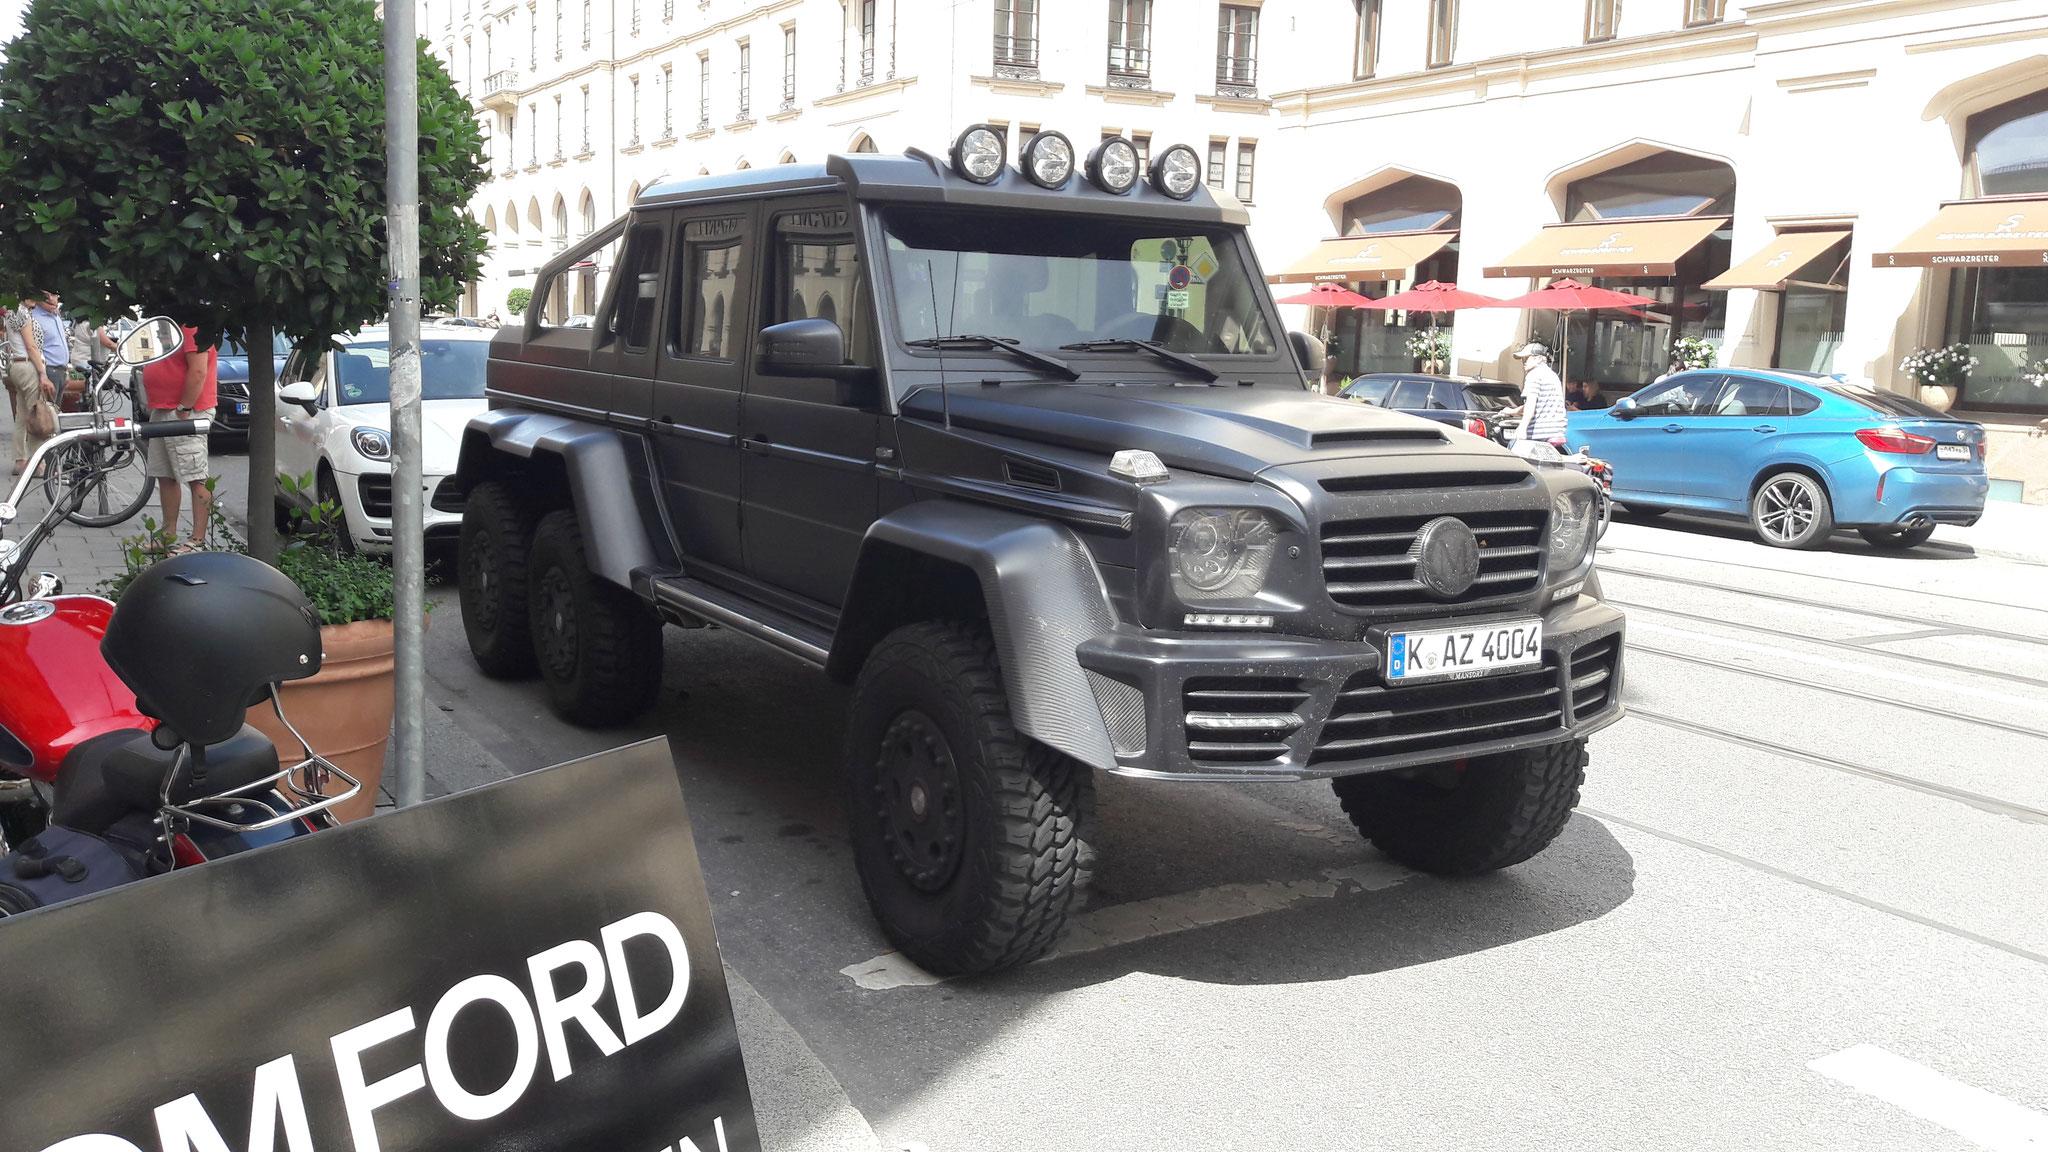 Mansory G 6x6 Xtreme - K-AZ-4004